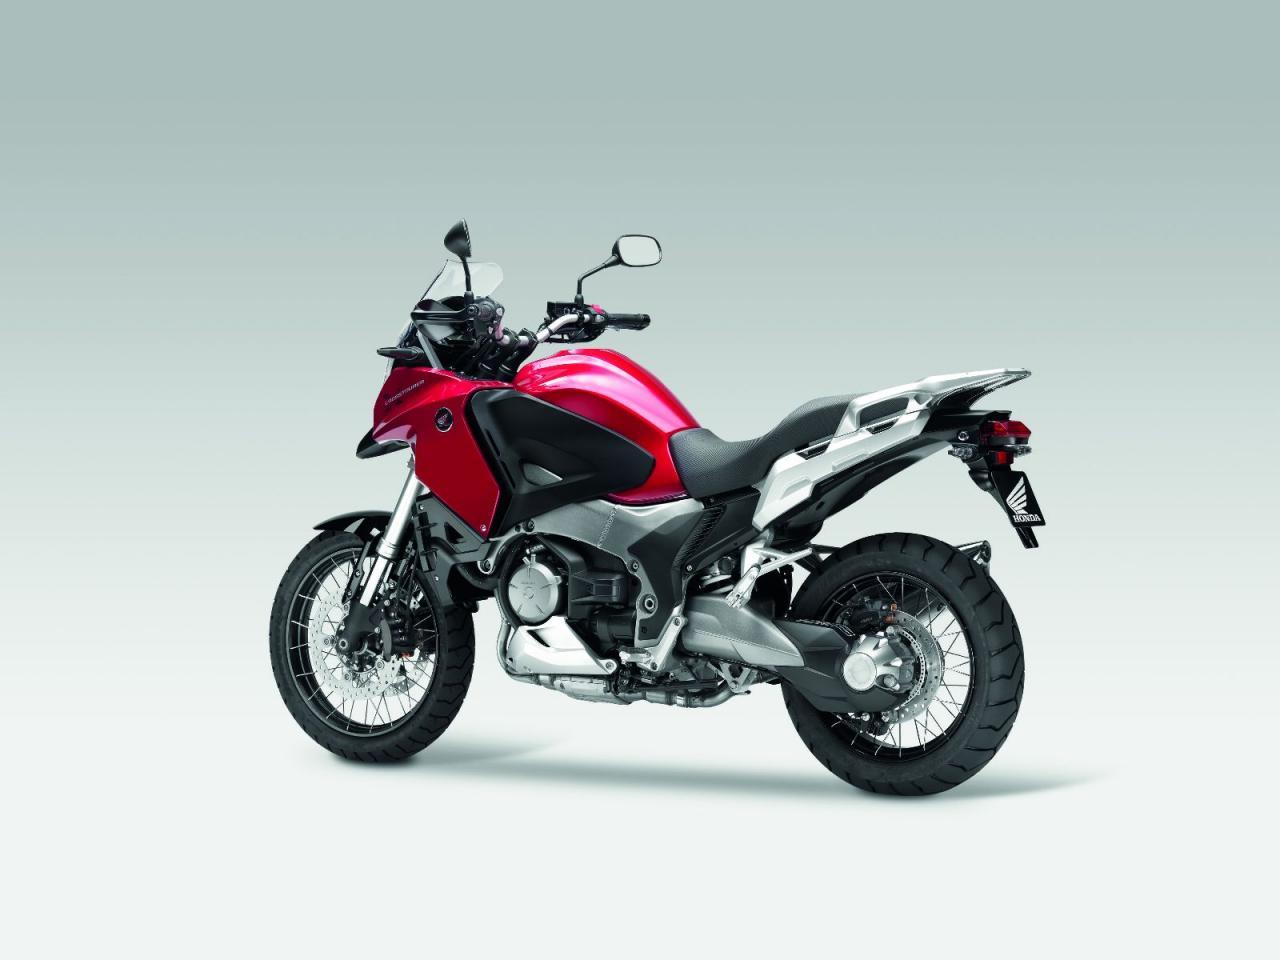 Honda Xl 125 V Varadero Bilder Und Technische Daten